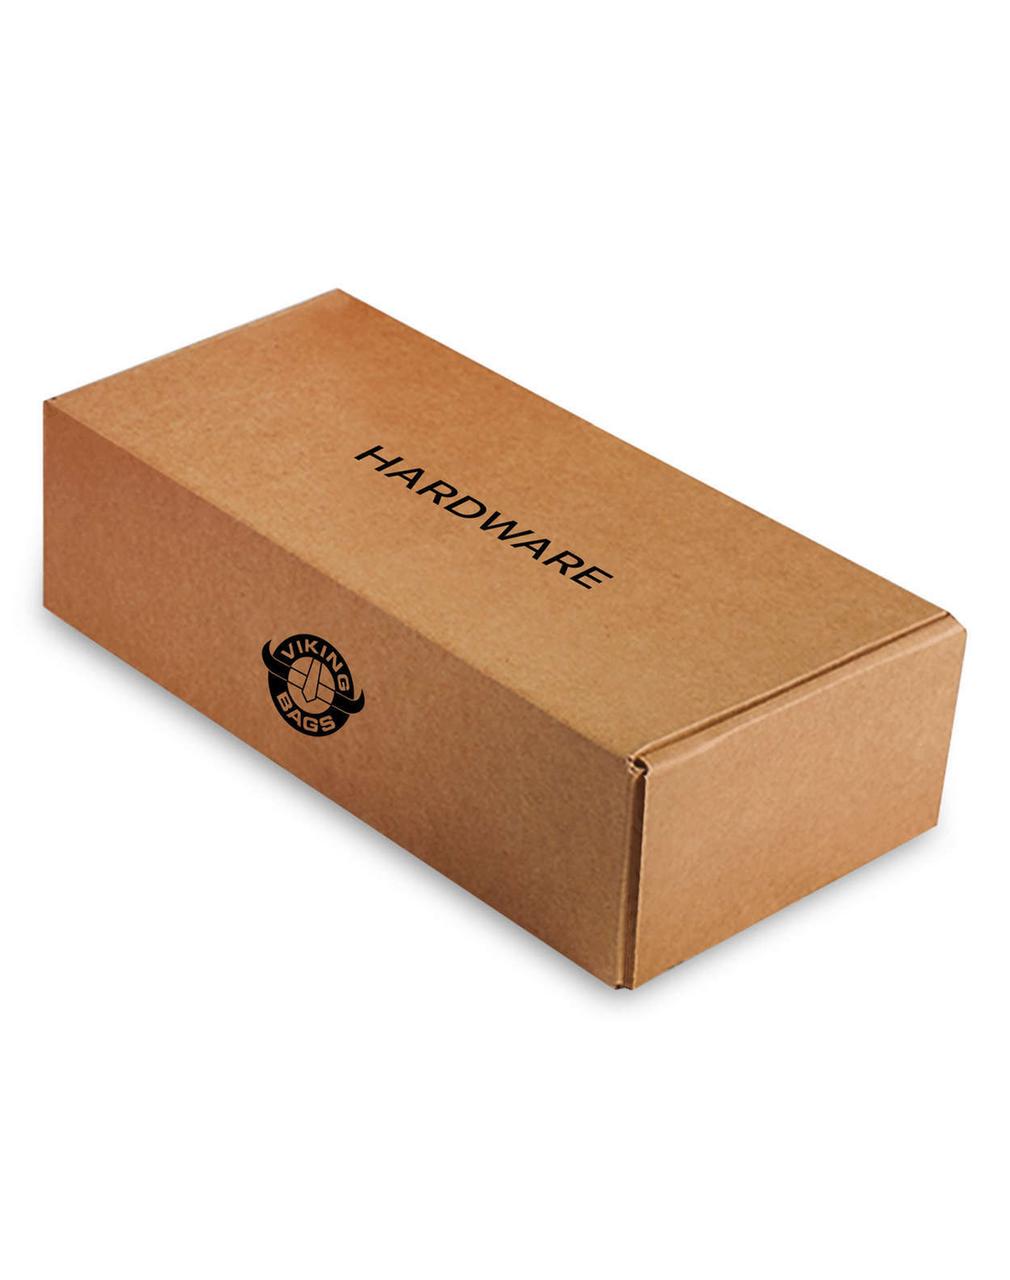 Honda VTX 1800 R (Retro) Medium Plain Slanted Motorcycle Saddlebags Hardware Box